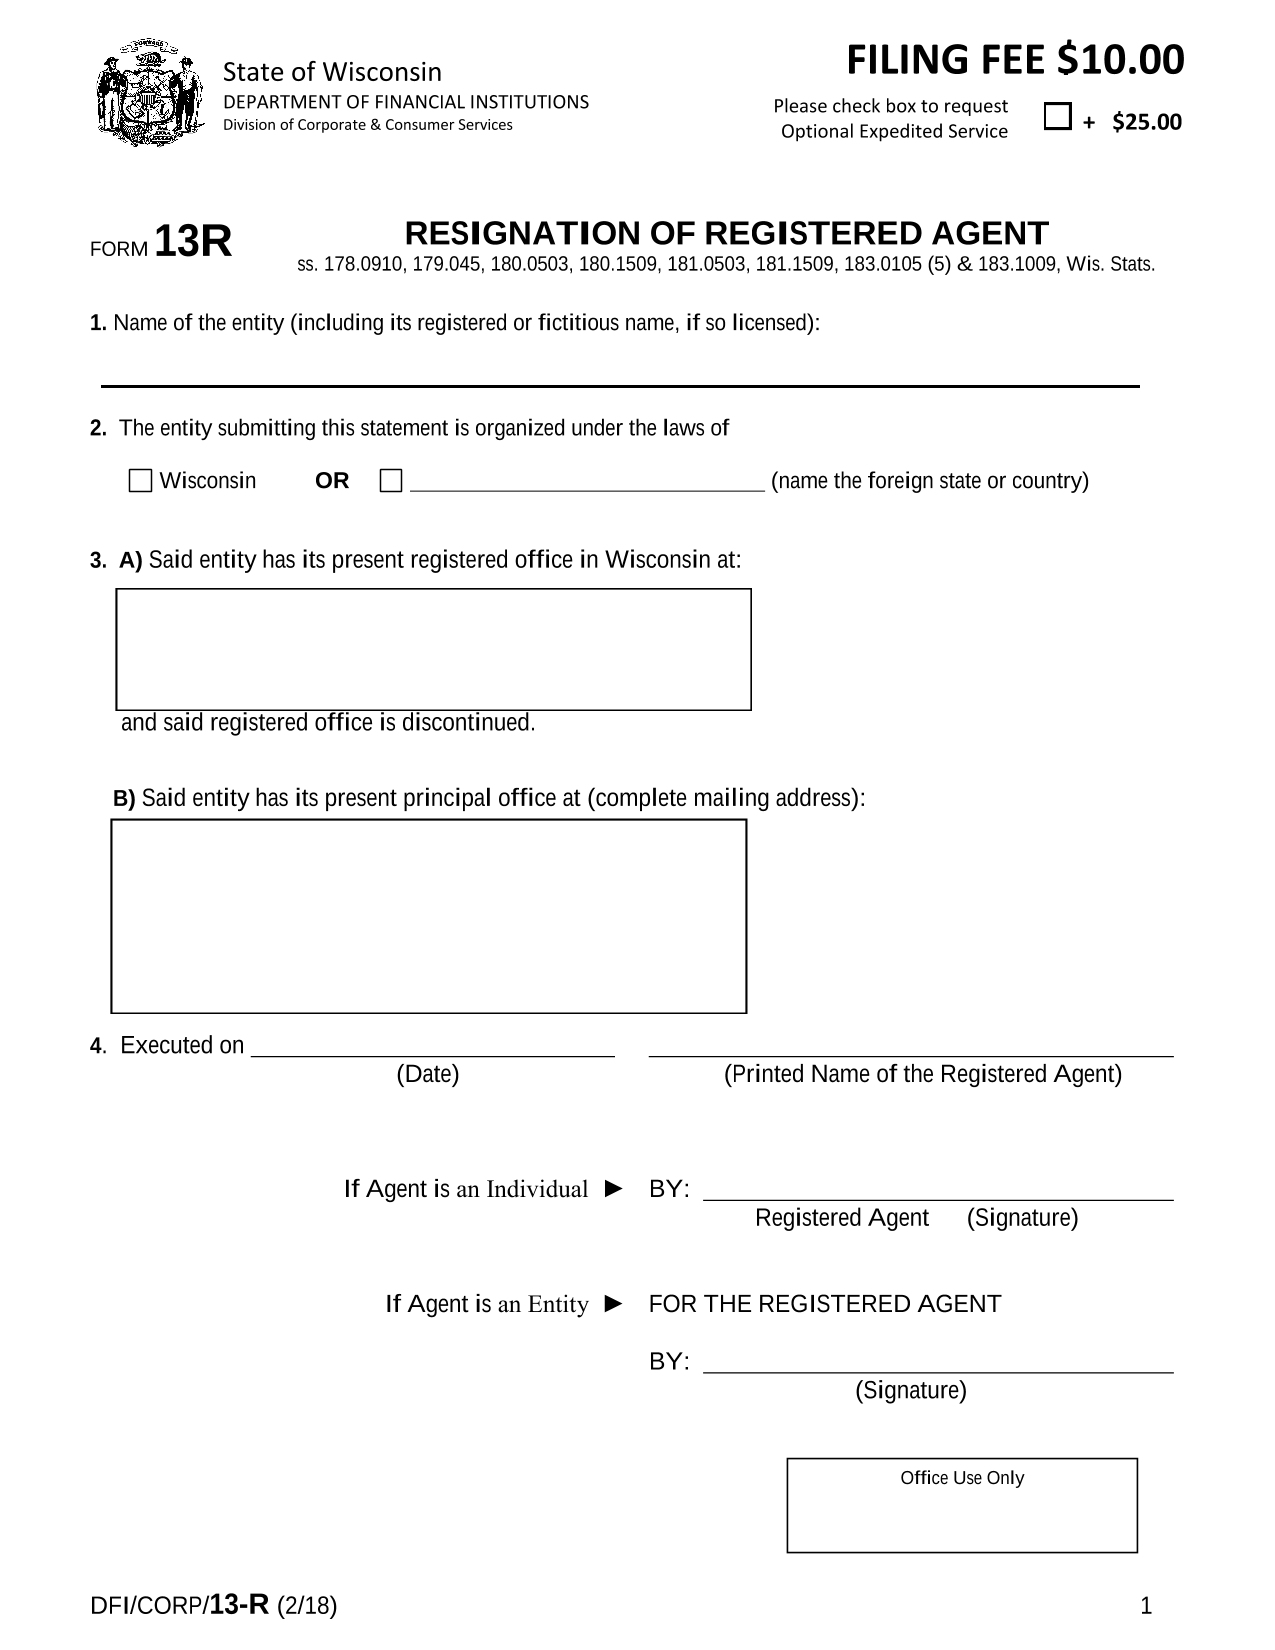 wisconsin-resignation-of-registered-agent